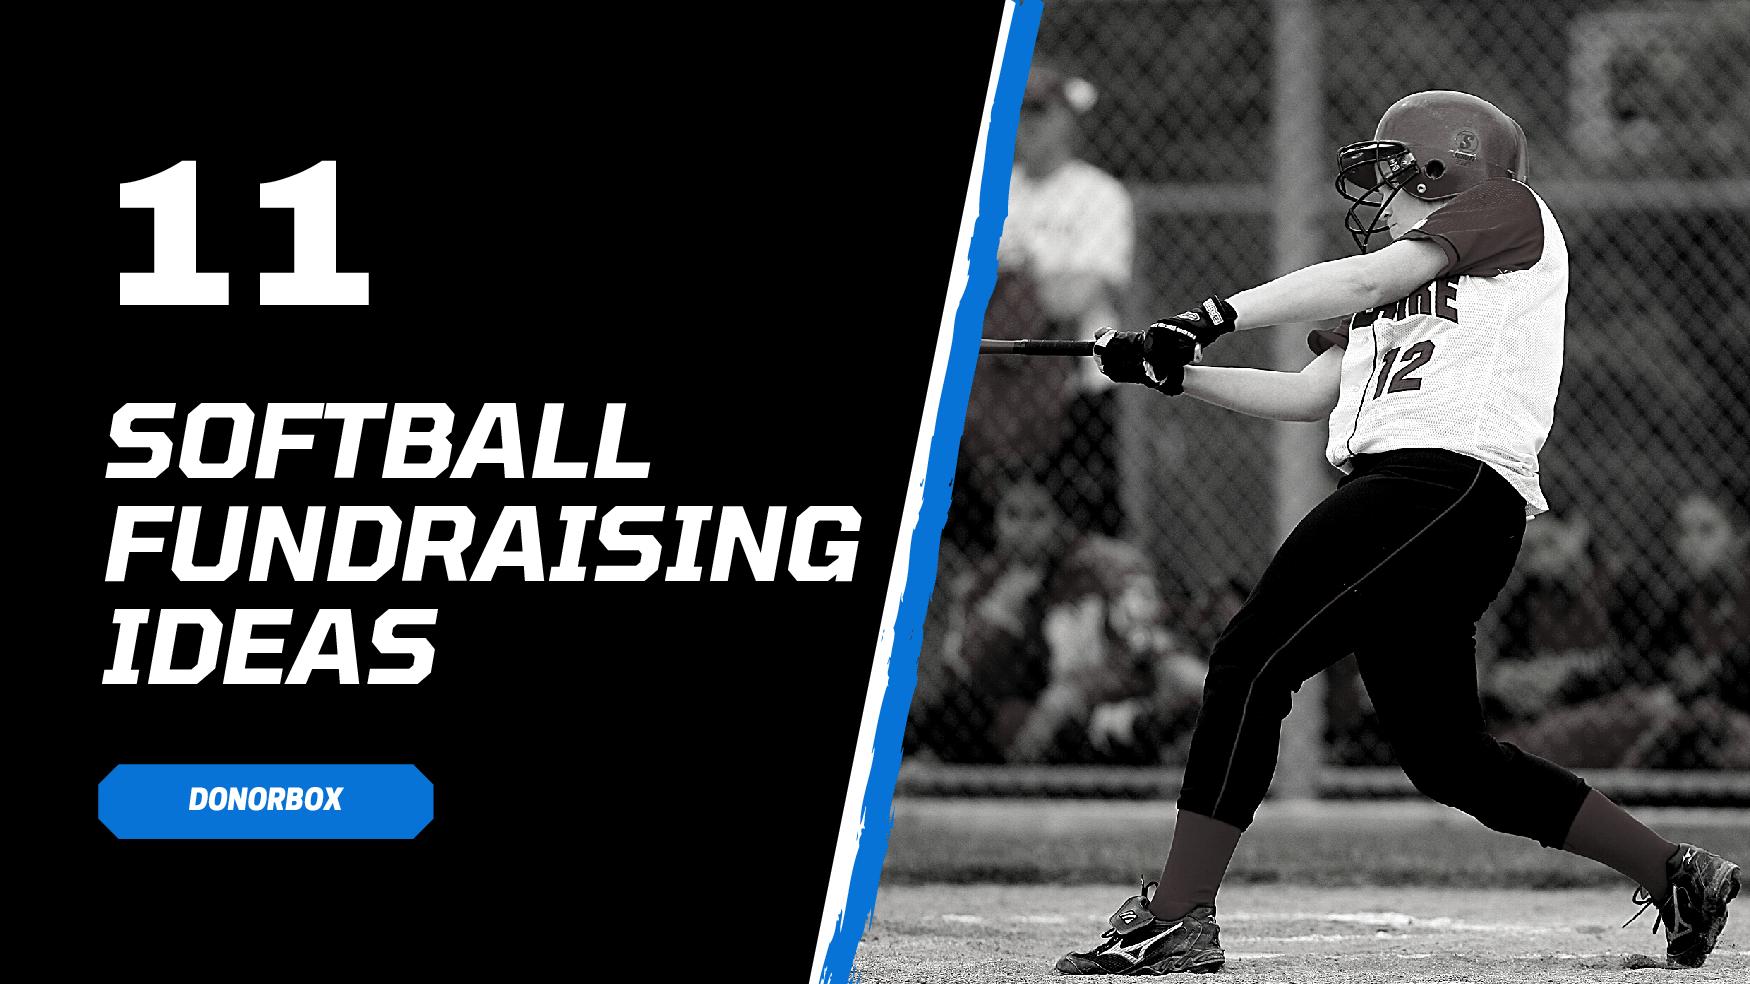 11 Fantastic Fundraising Ideas for Your Softball Team